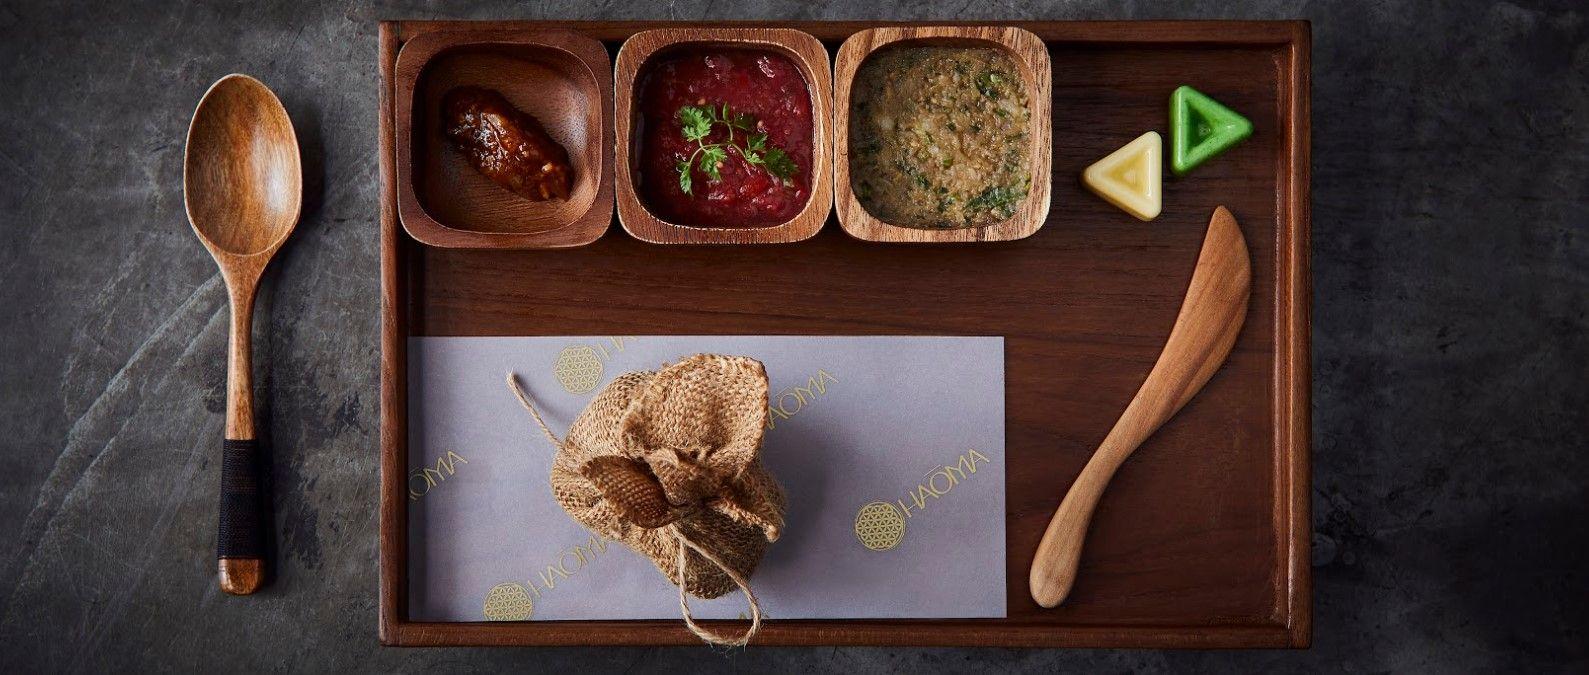 Haoma Is Bangkok's First Zero-Waste Urban Farm Dining Experience